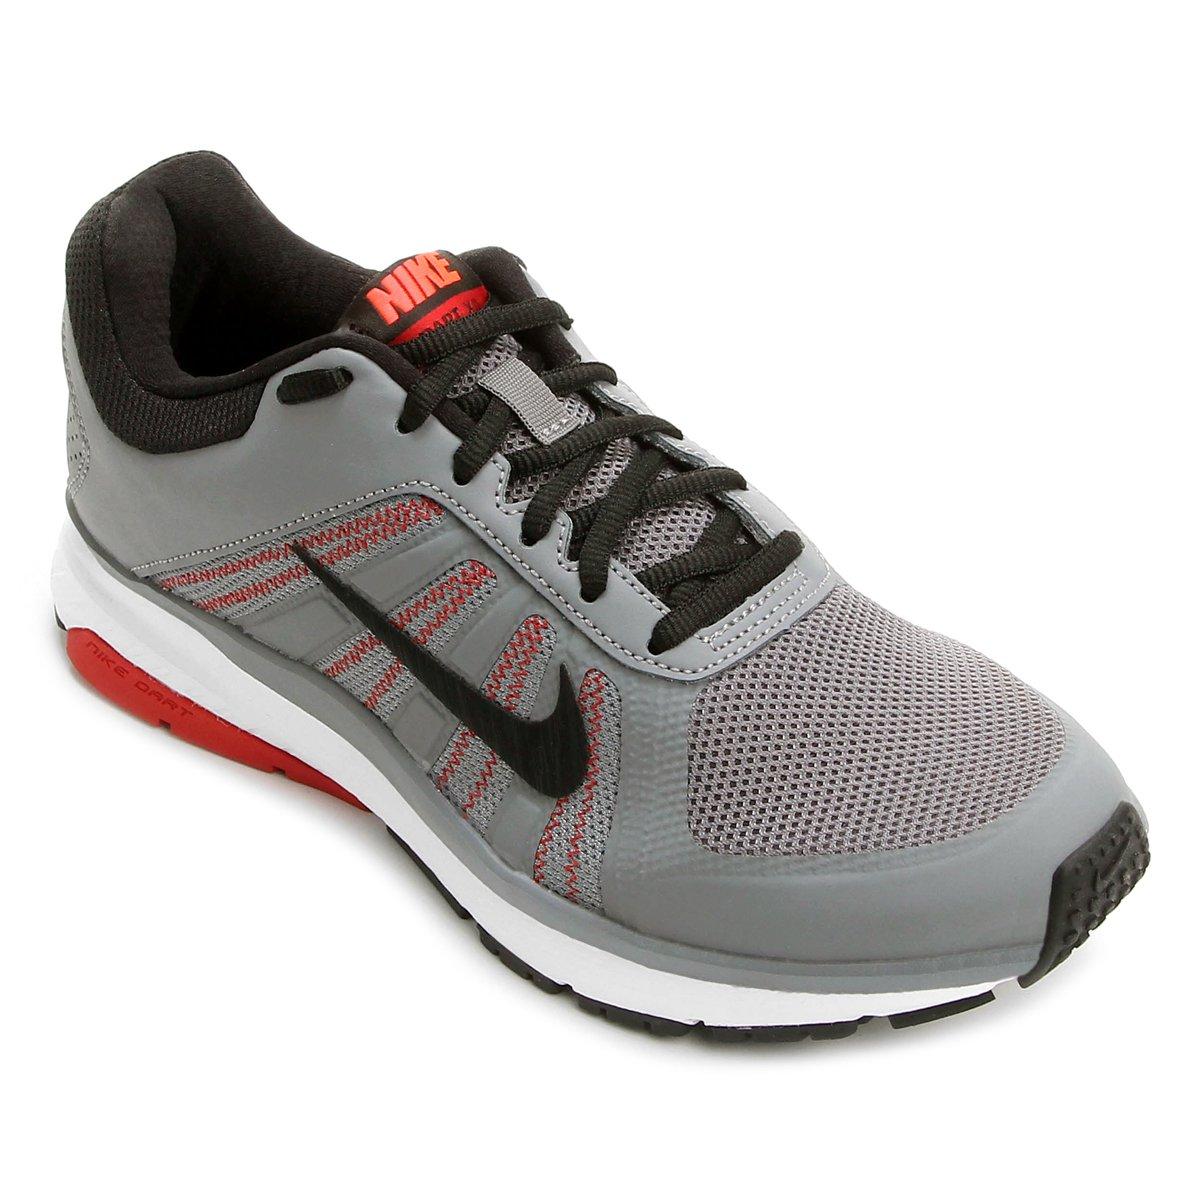 77ba251ebb3f5 Tênis Nike Dart 12 MSL Masculino - Cinza e Preto - Compre Agora ...